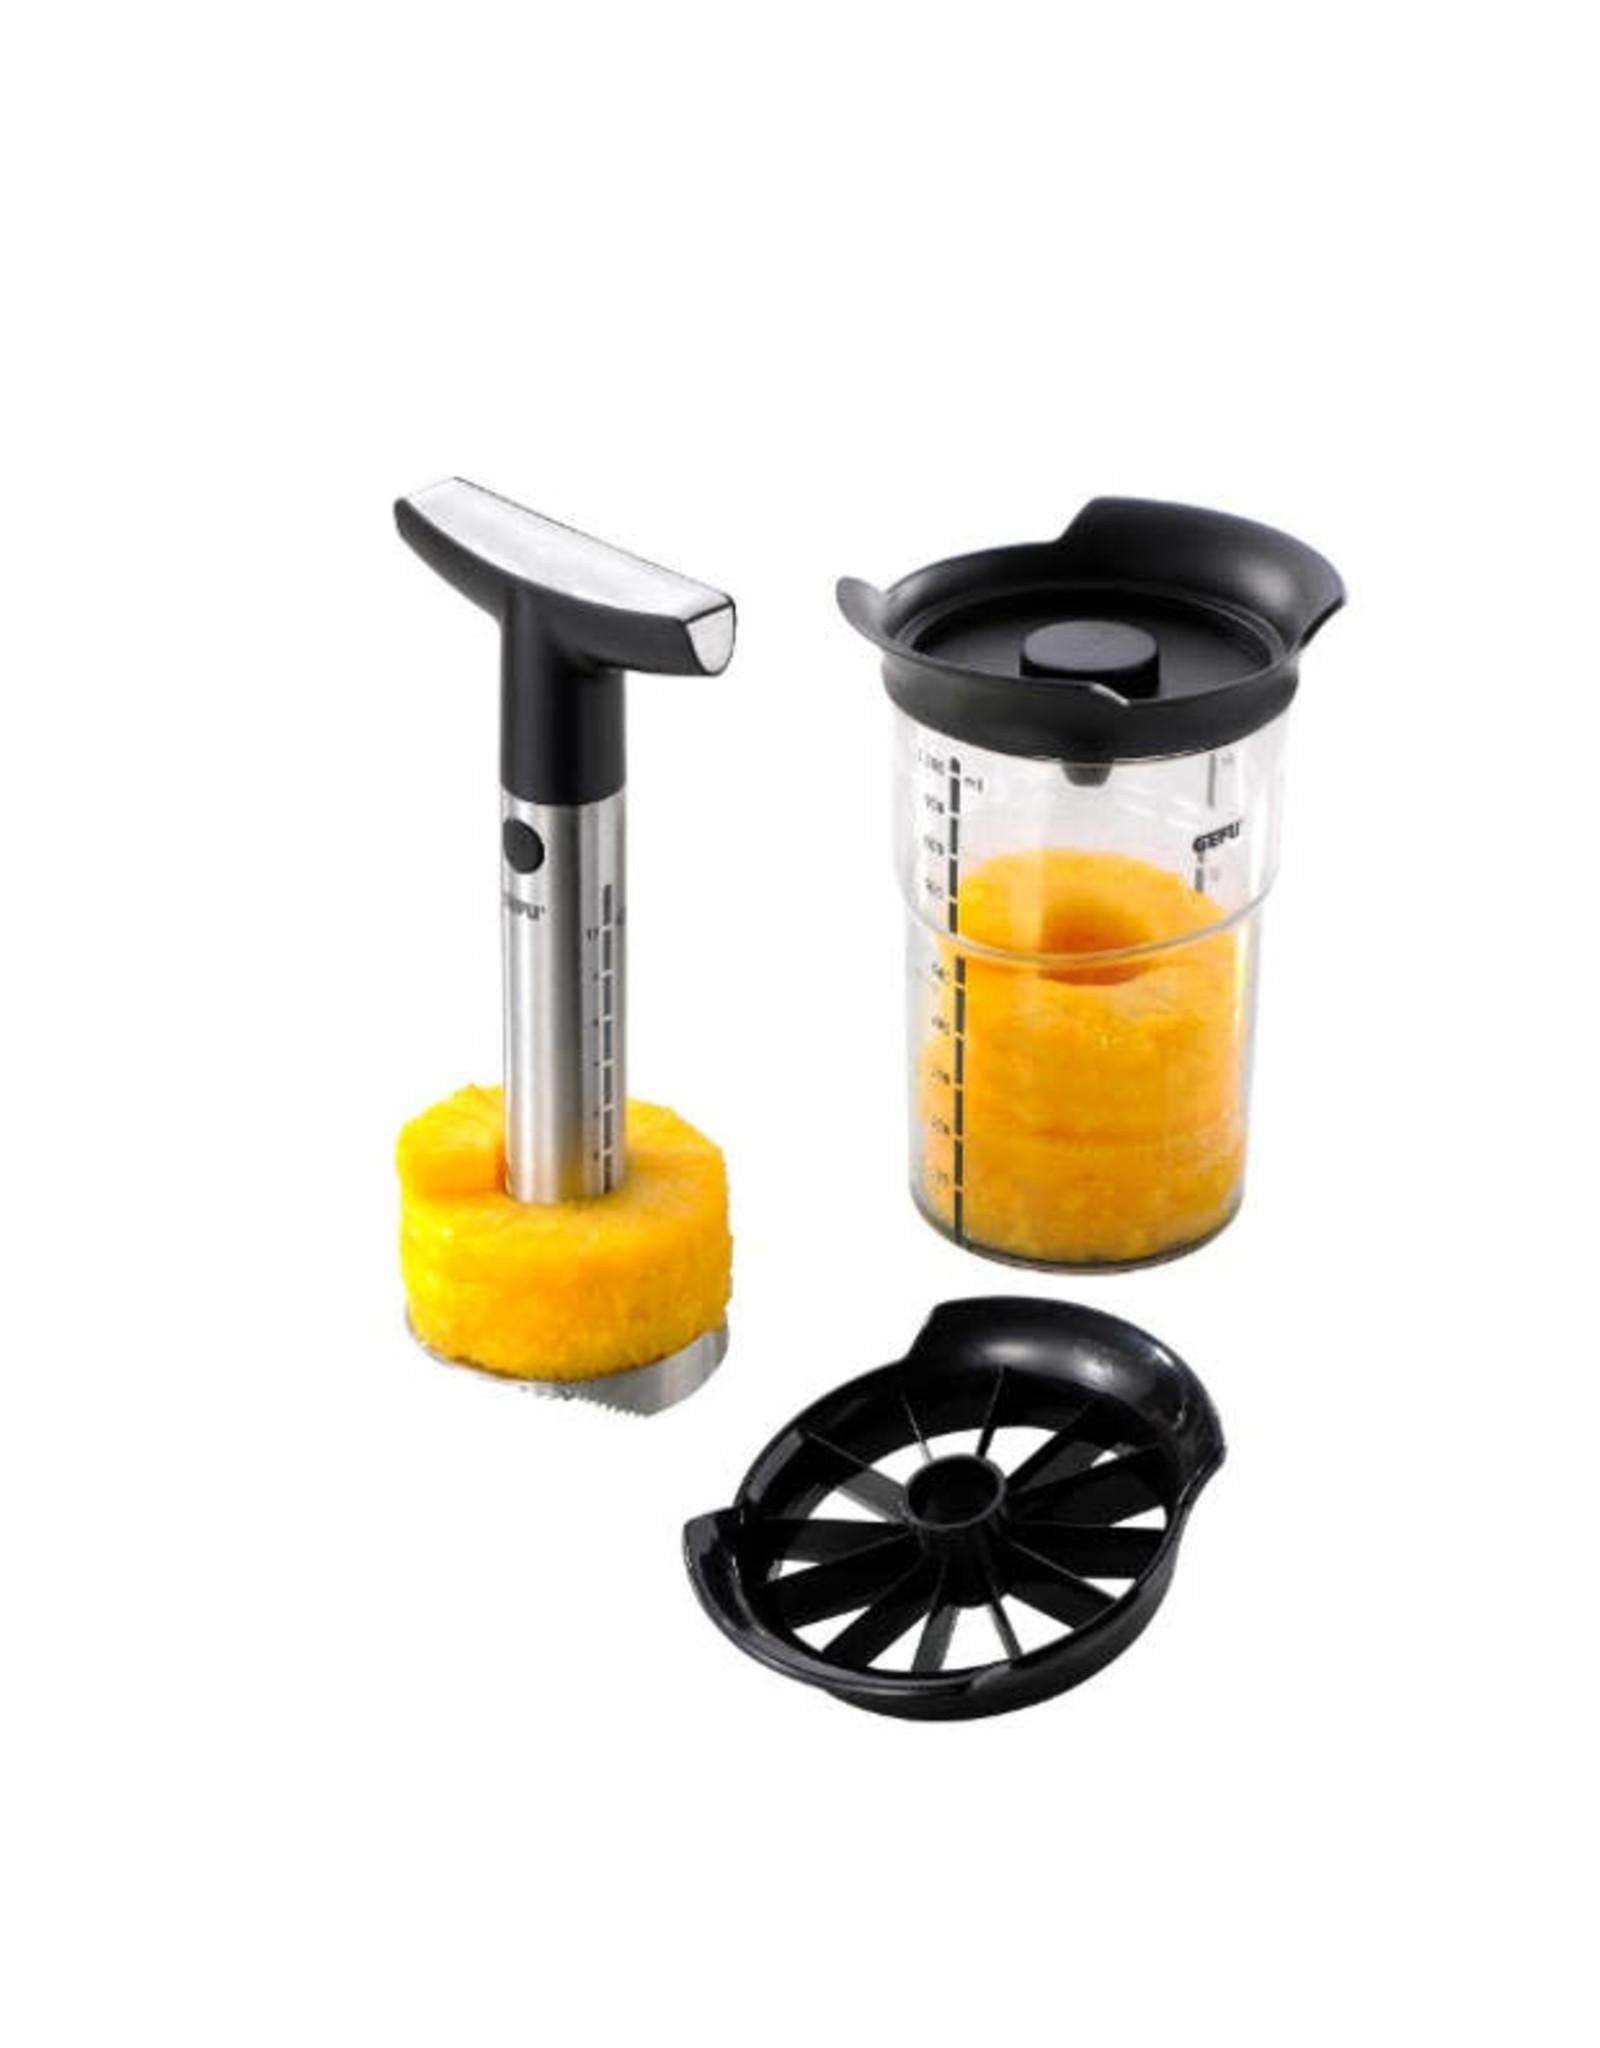 Gefu. Ananassnijder Professional Plus